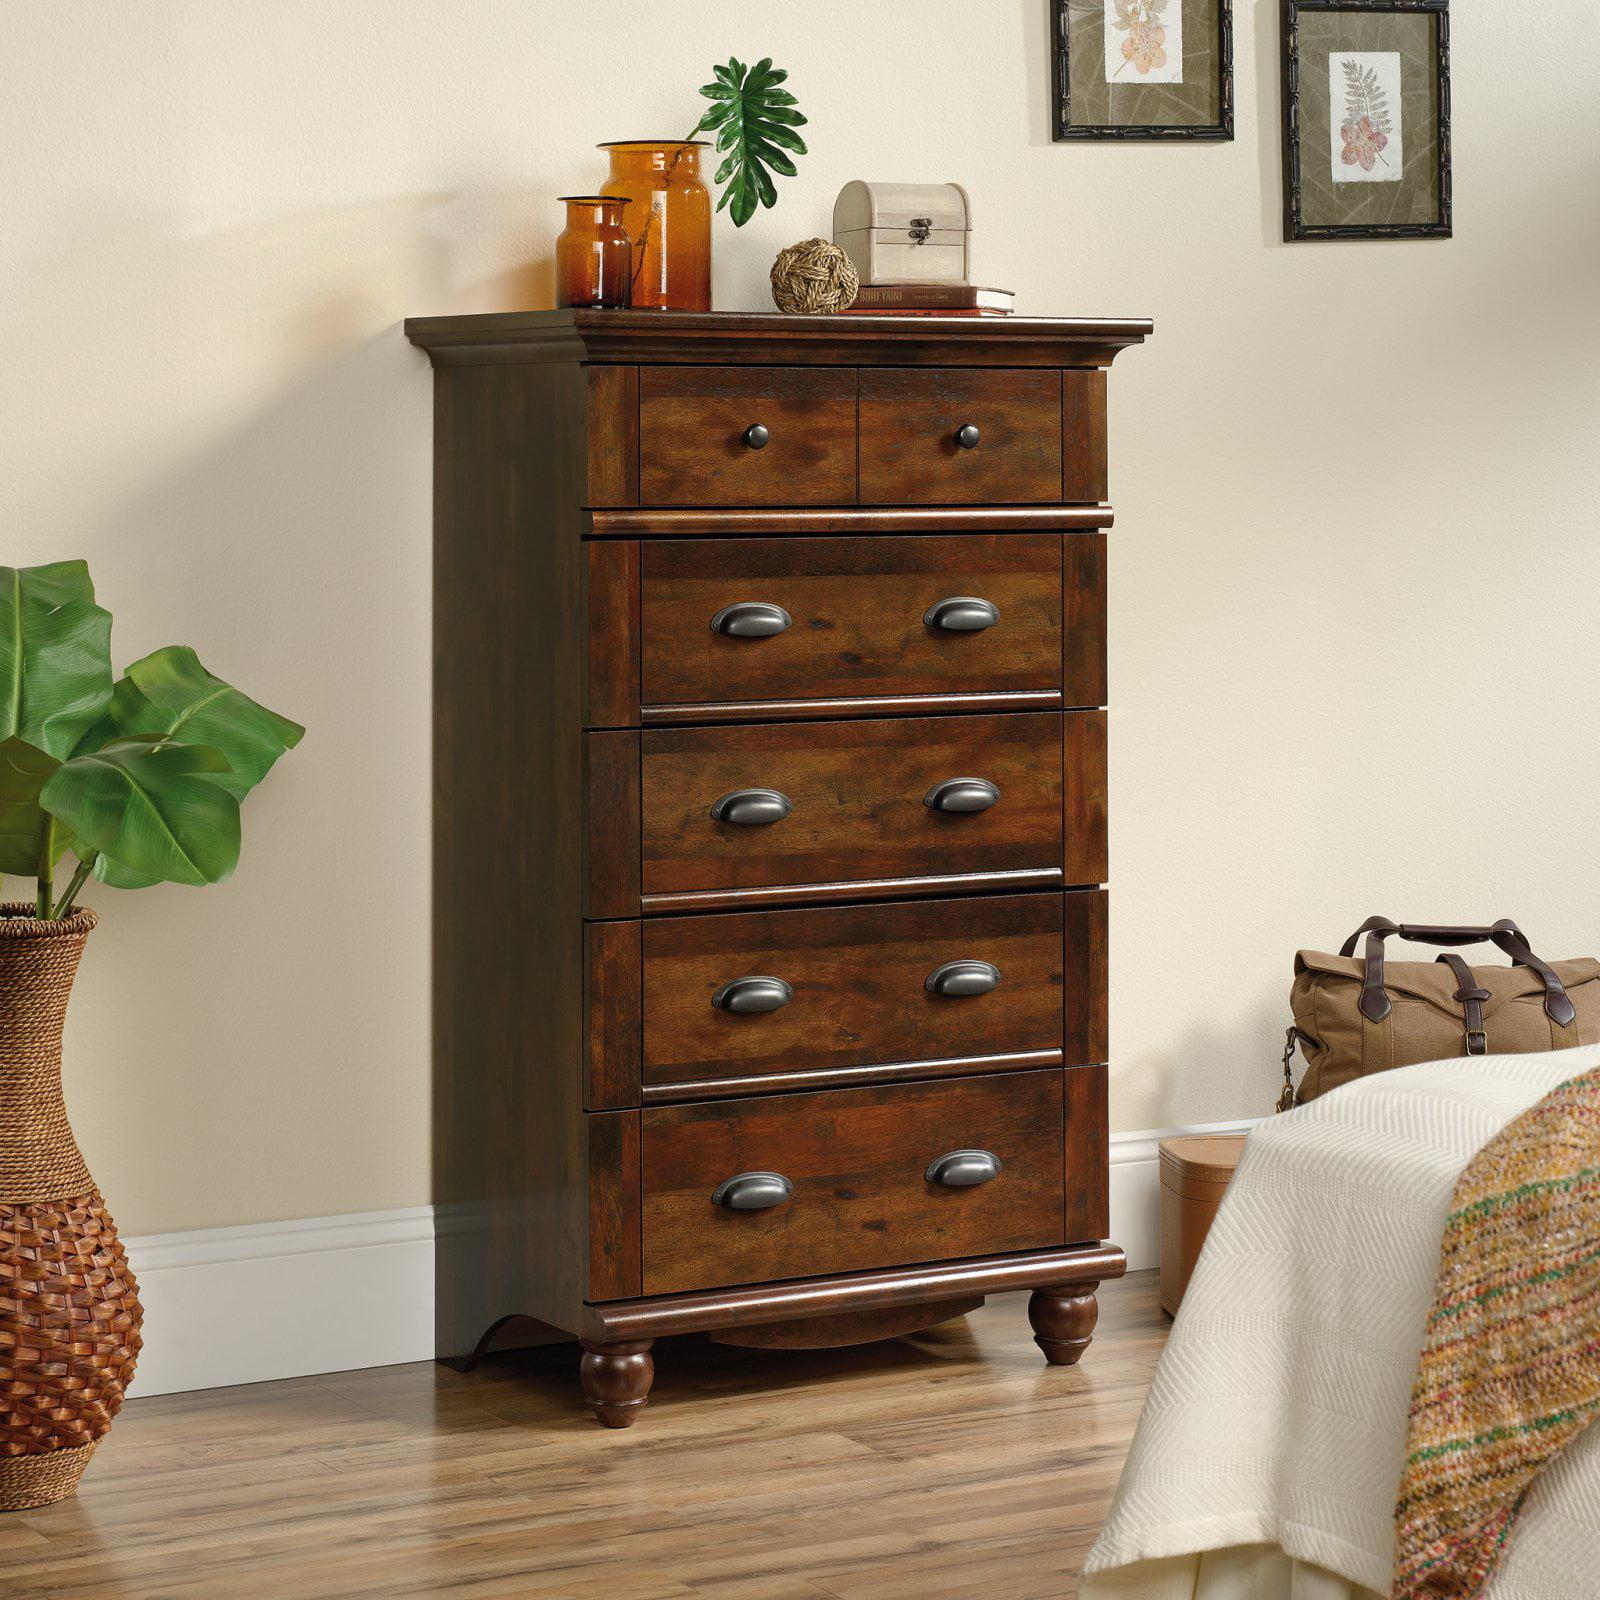 Sauder Harbor View 5-Drawer Dresser, Multiple Finishes by Sauder Woodworking Co